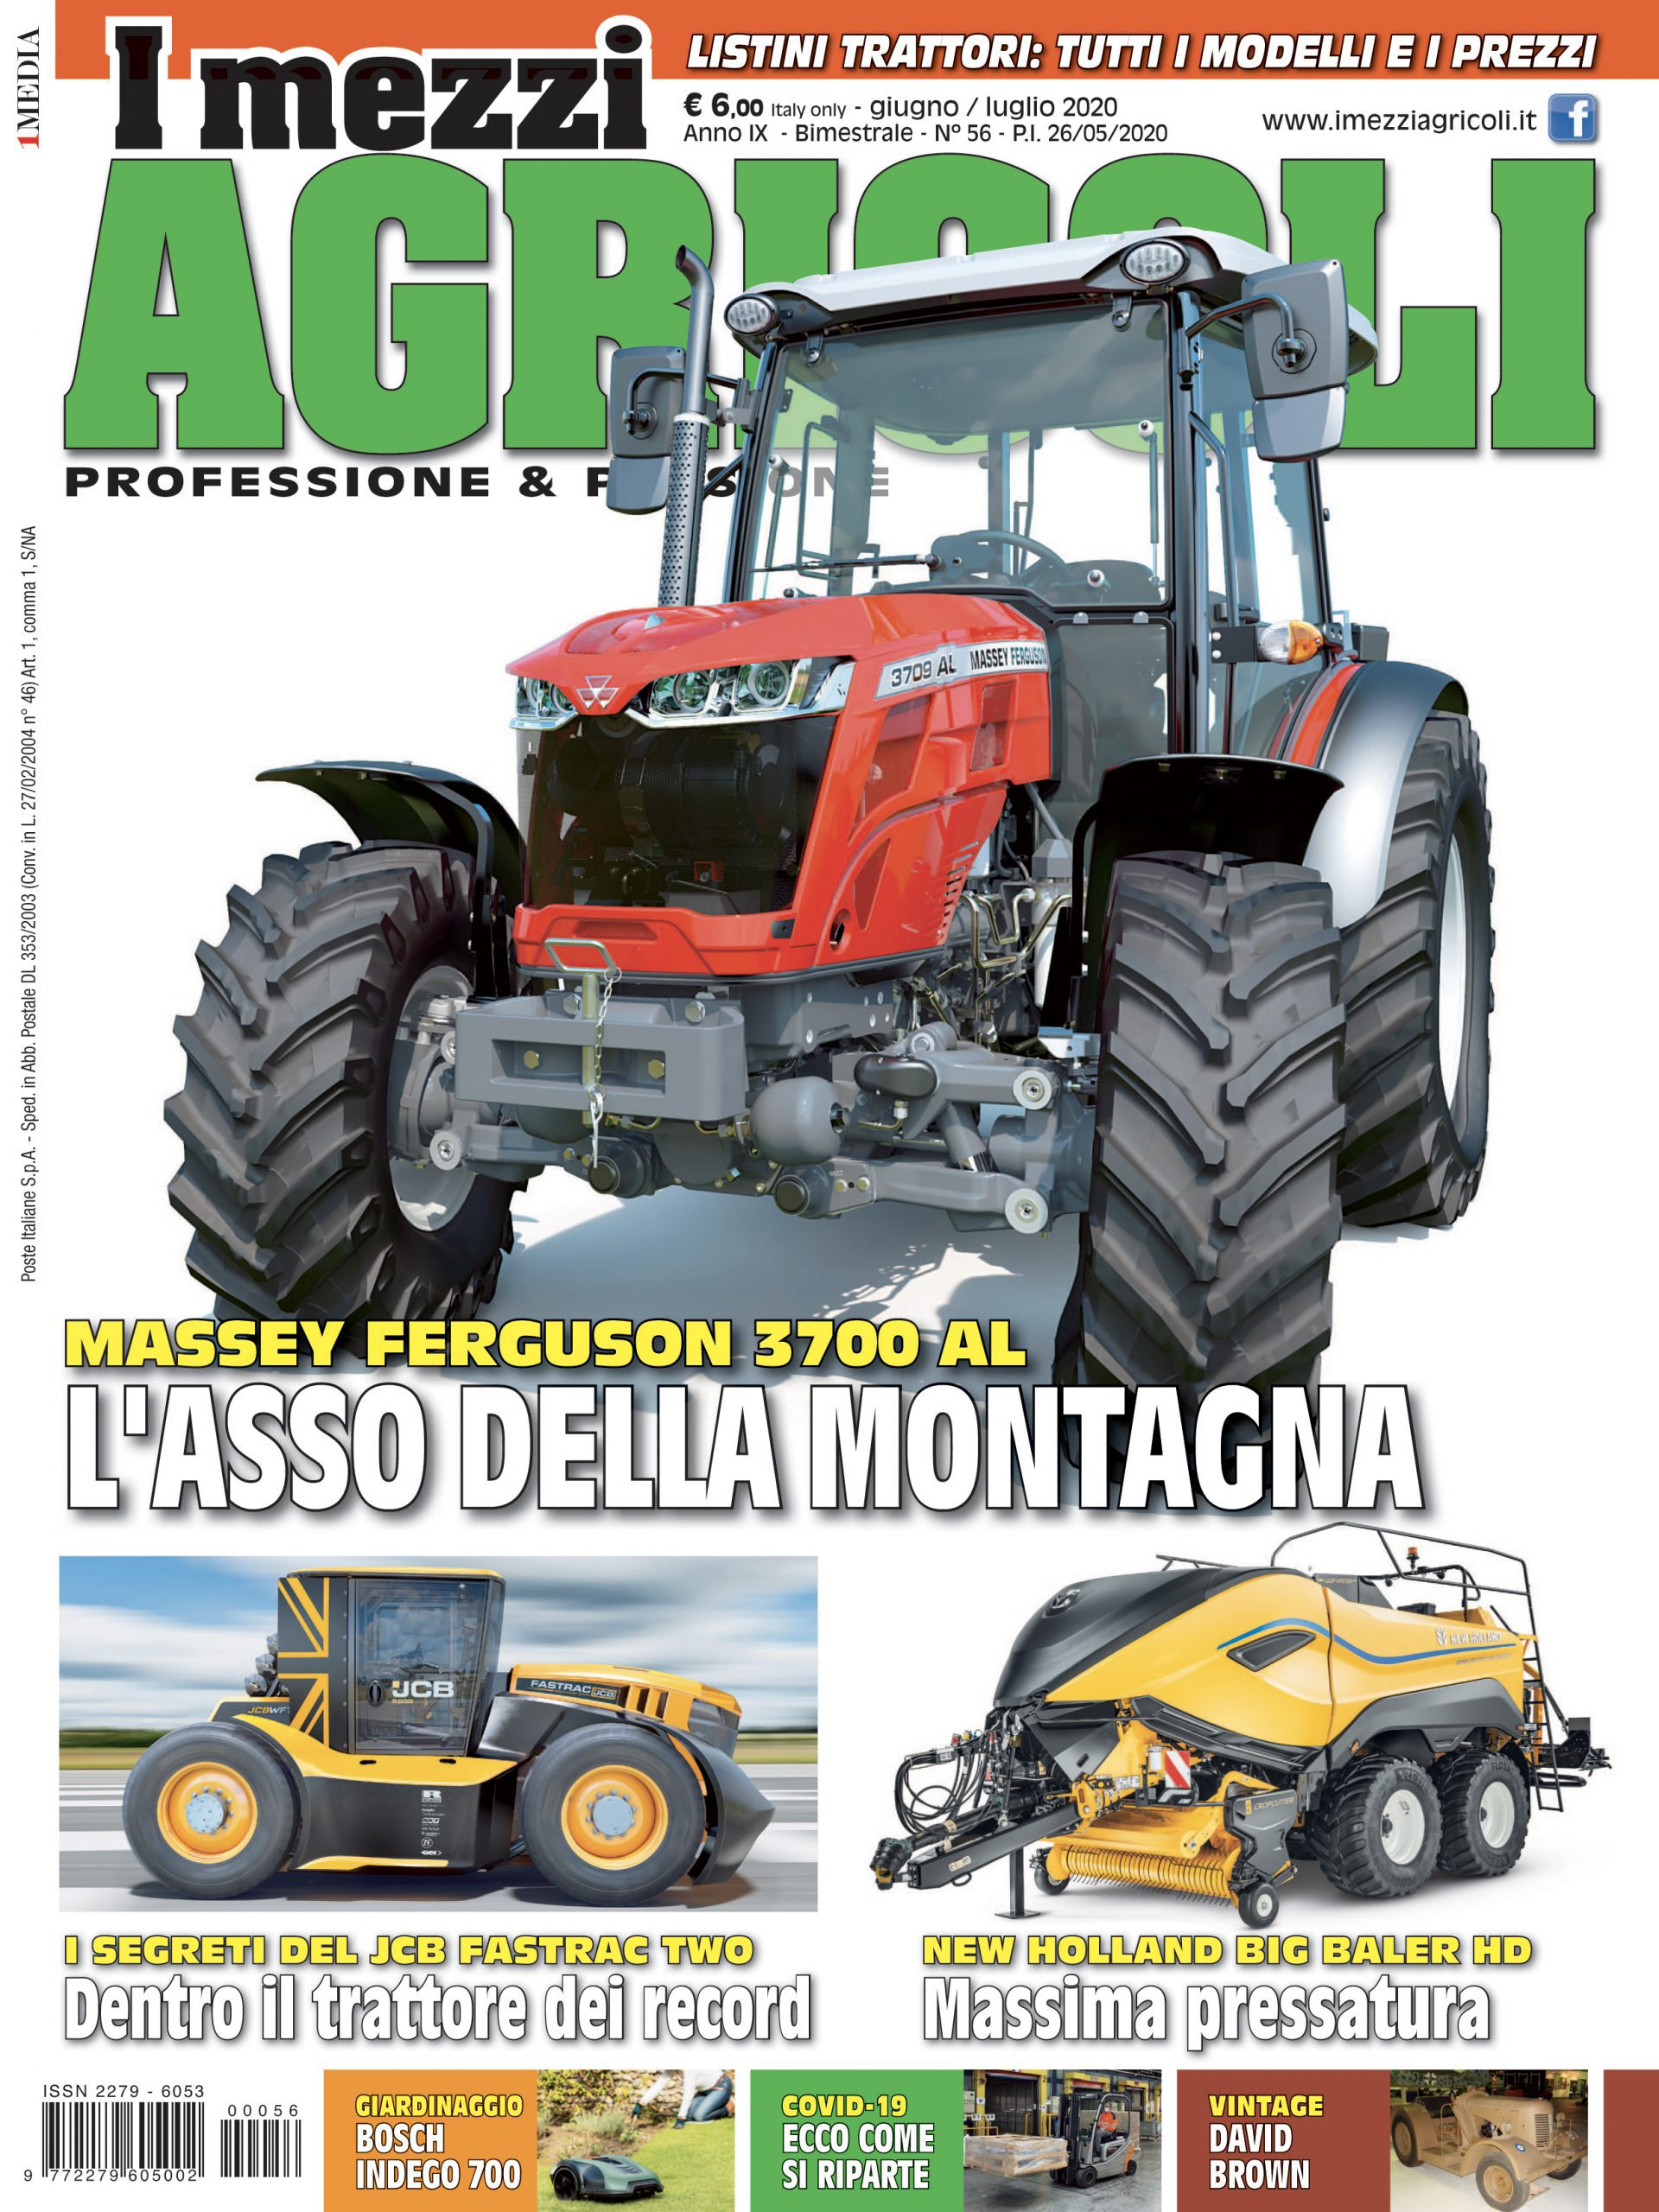 I Mezzi Agricoli n.56